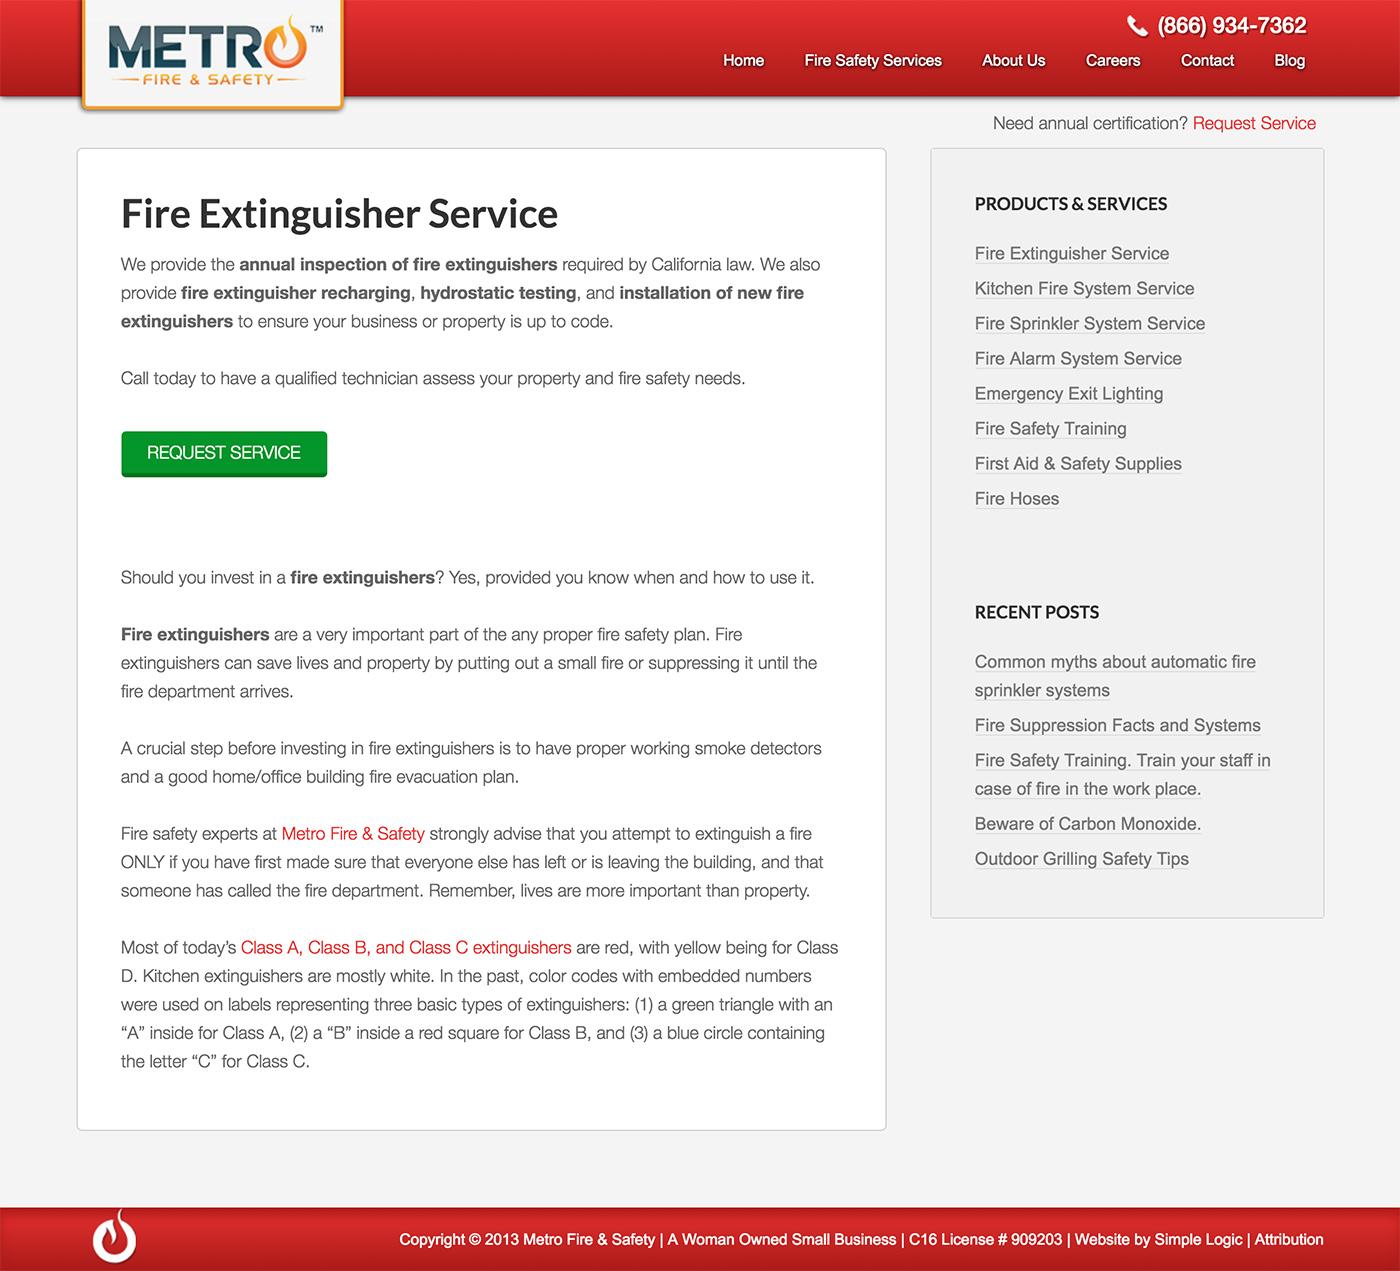 metrofire-safety-single